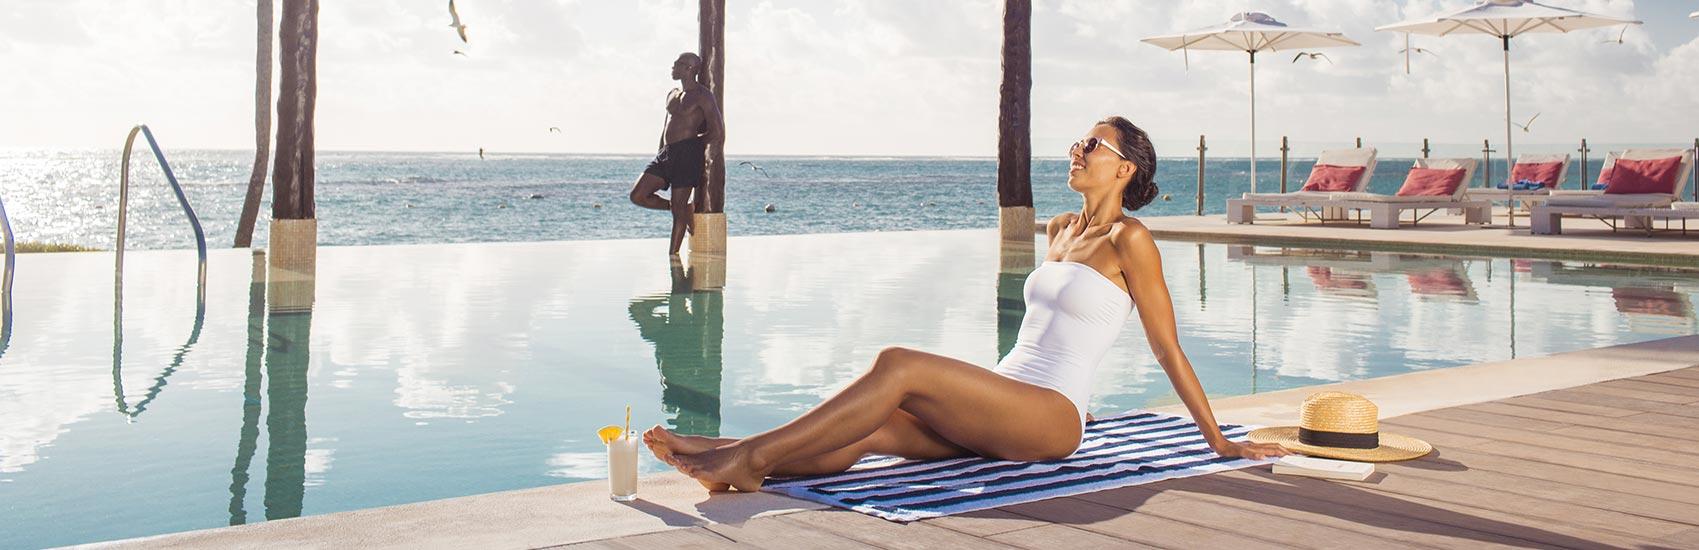 Club Med Early Booking Savings 1